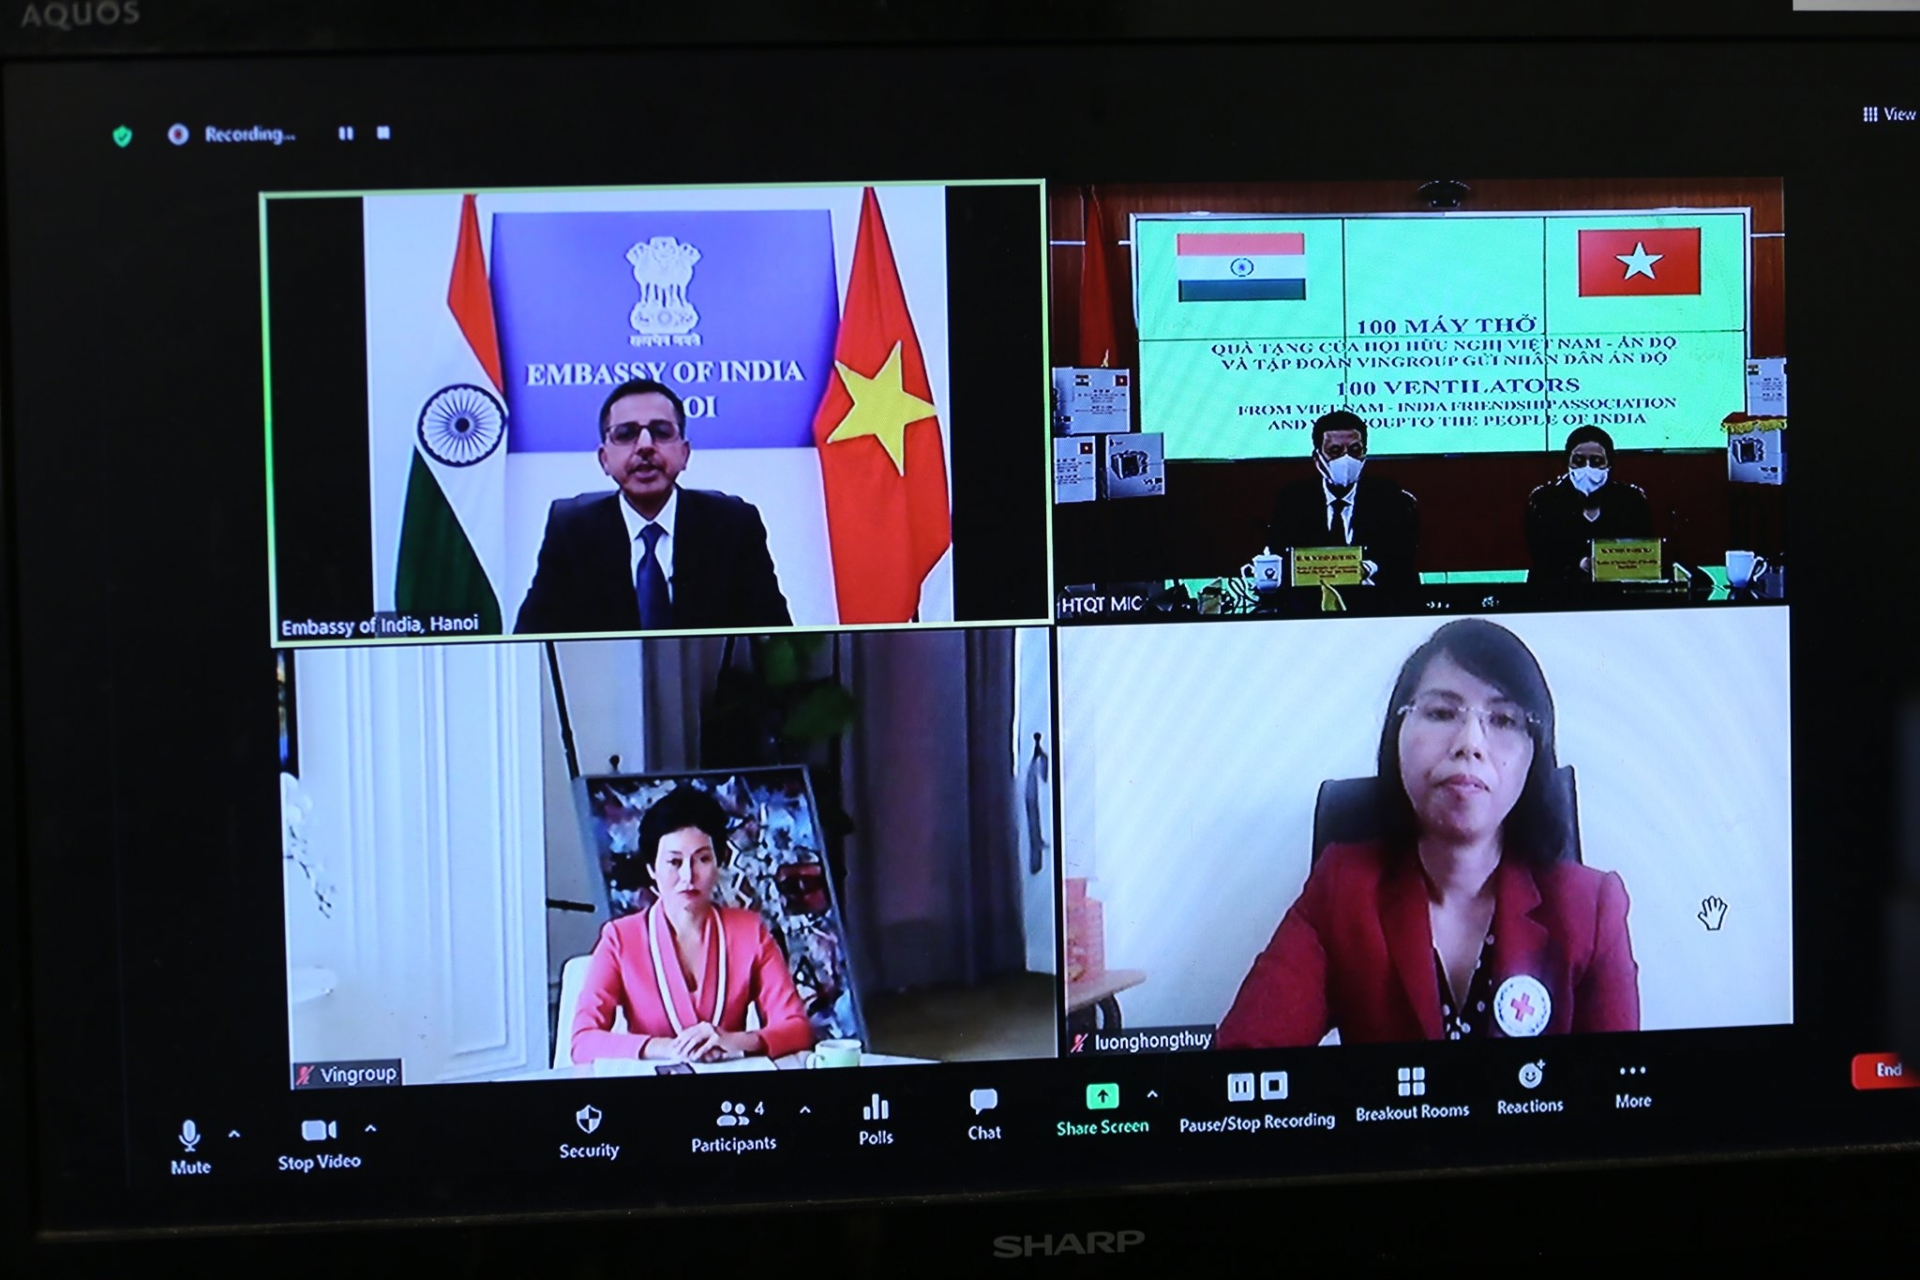 Friendship Association gives people of India 100 ventilators